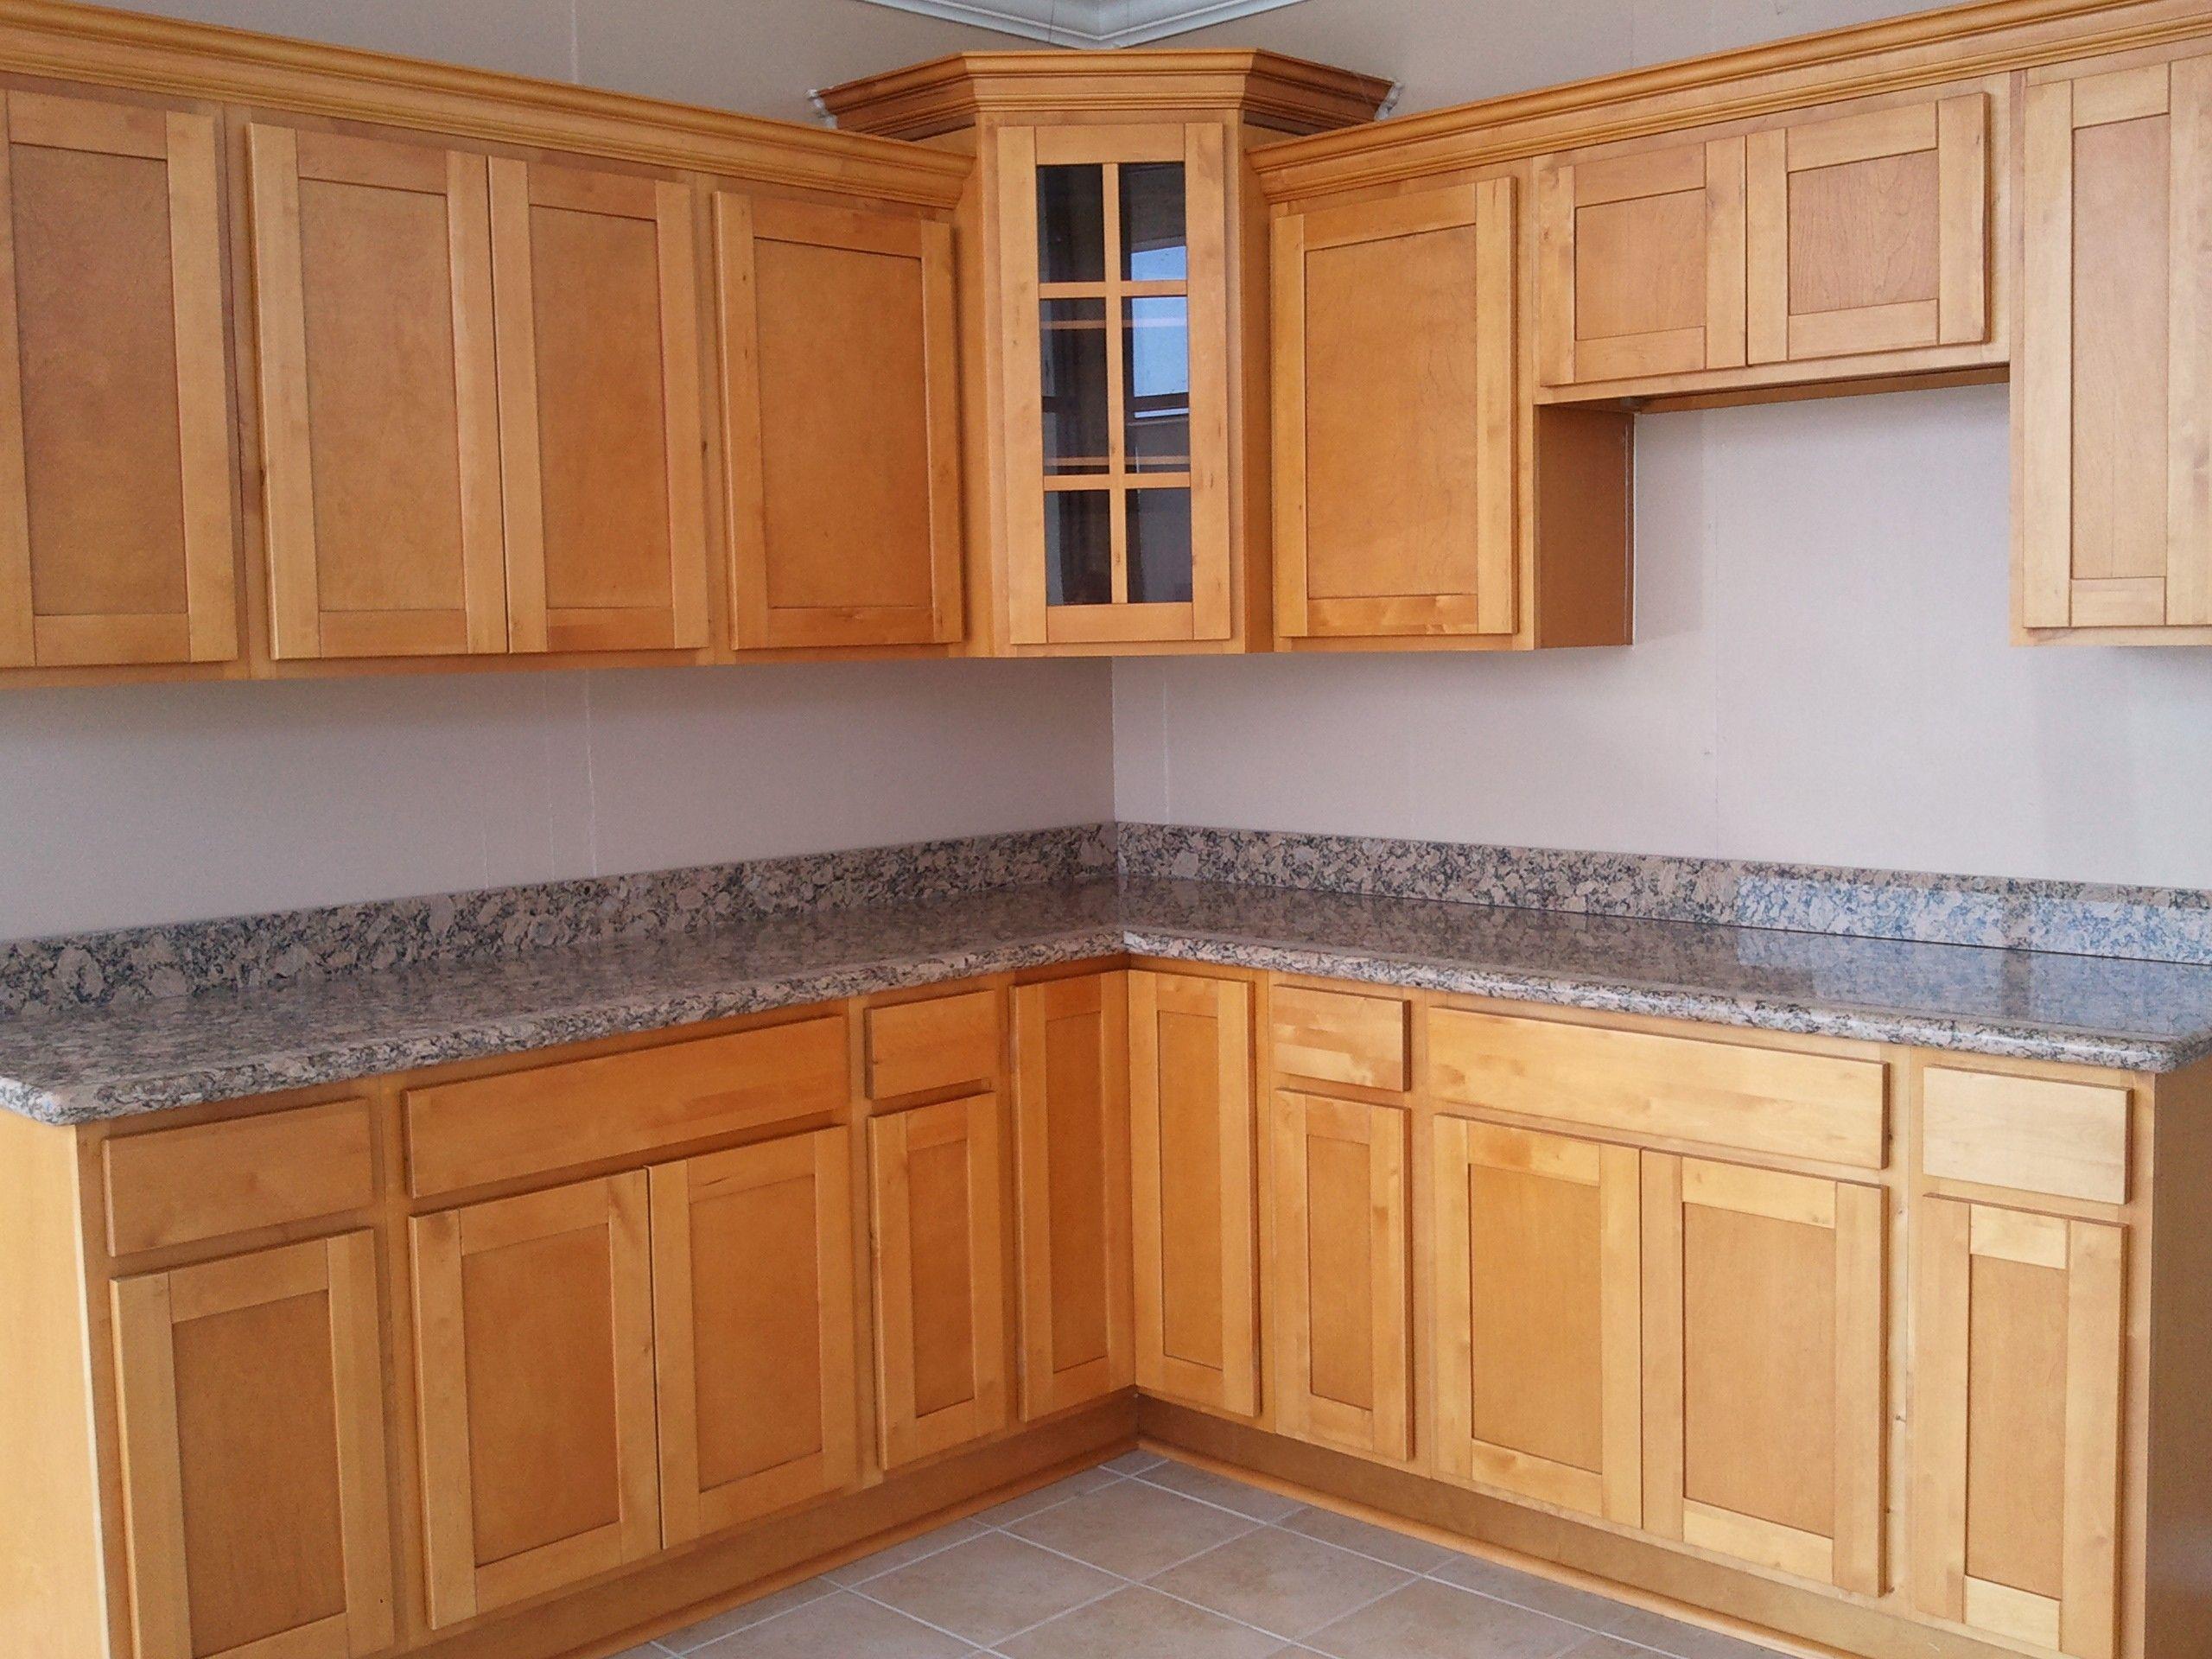 Birch Kitchen Cabinets Reviews Shaker Wooden Wood